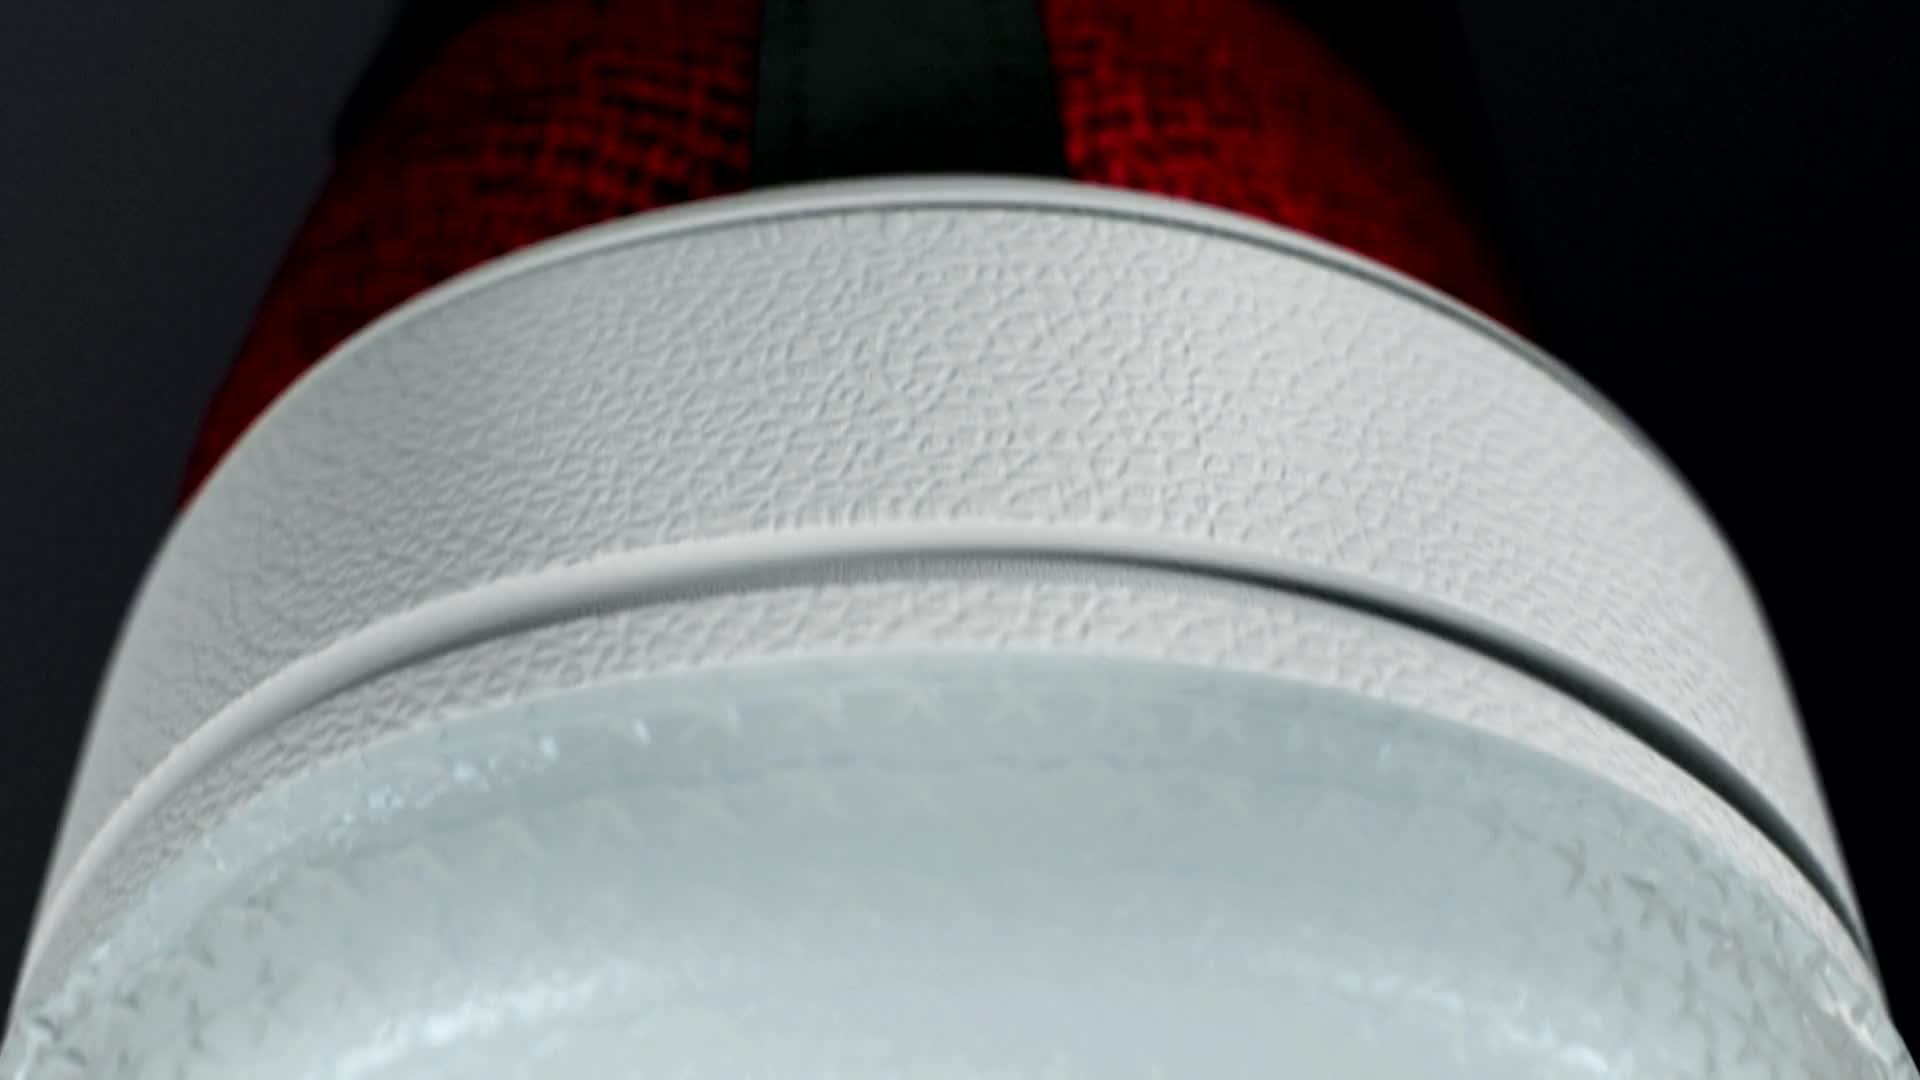 Nike Flyknit sport 3d cgi air force 1 sole